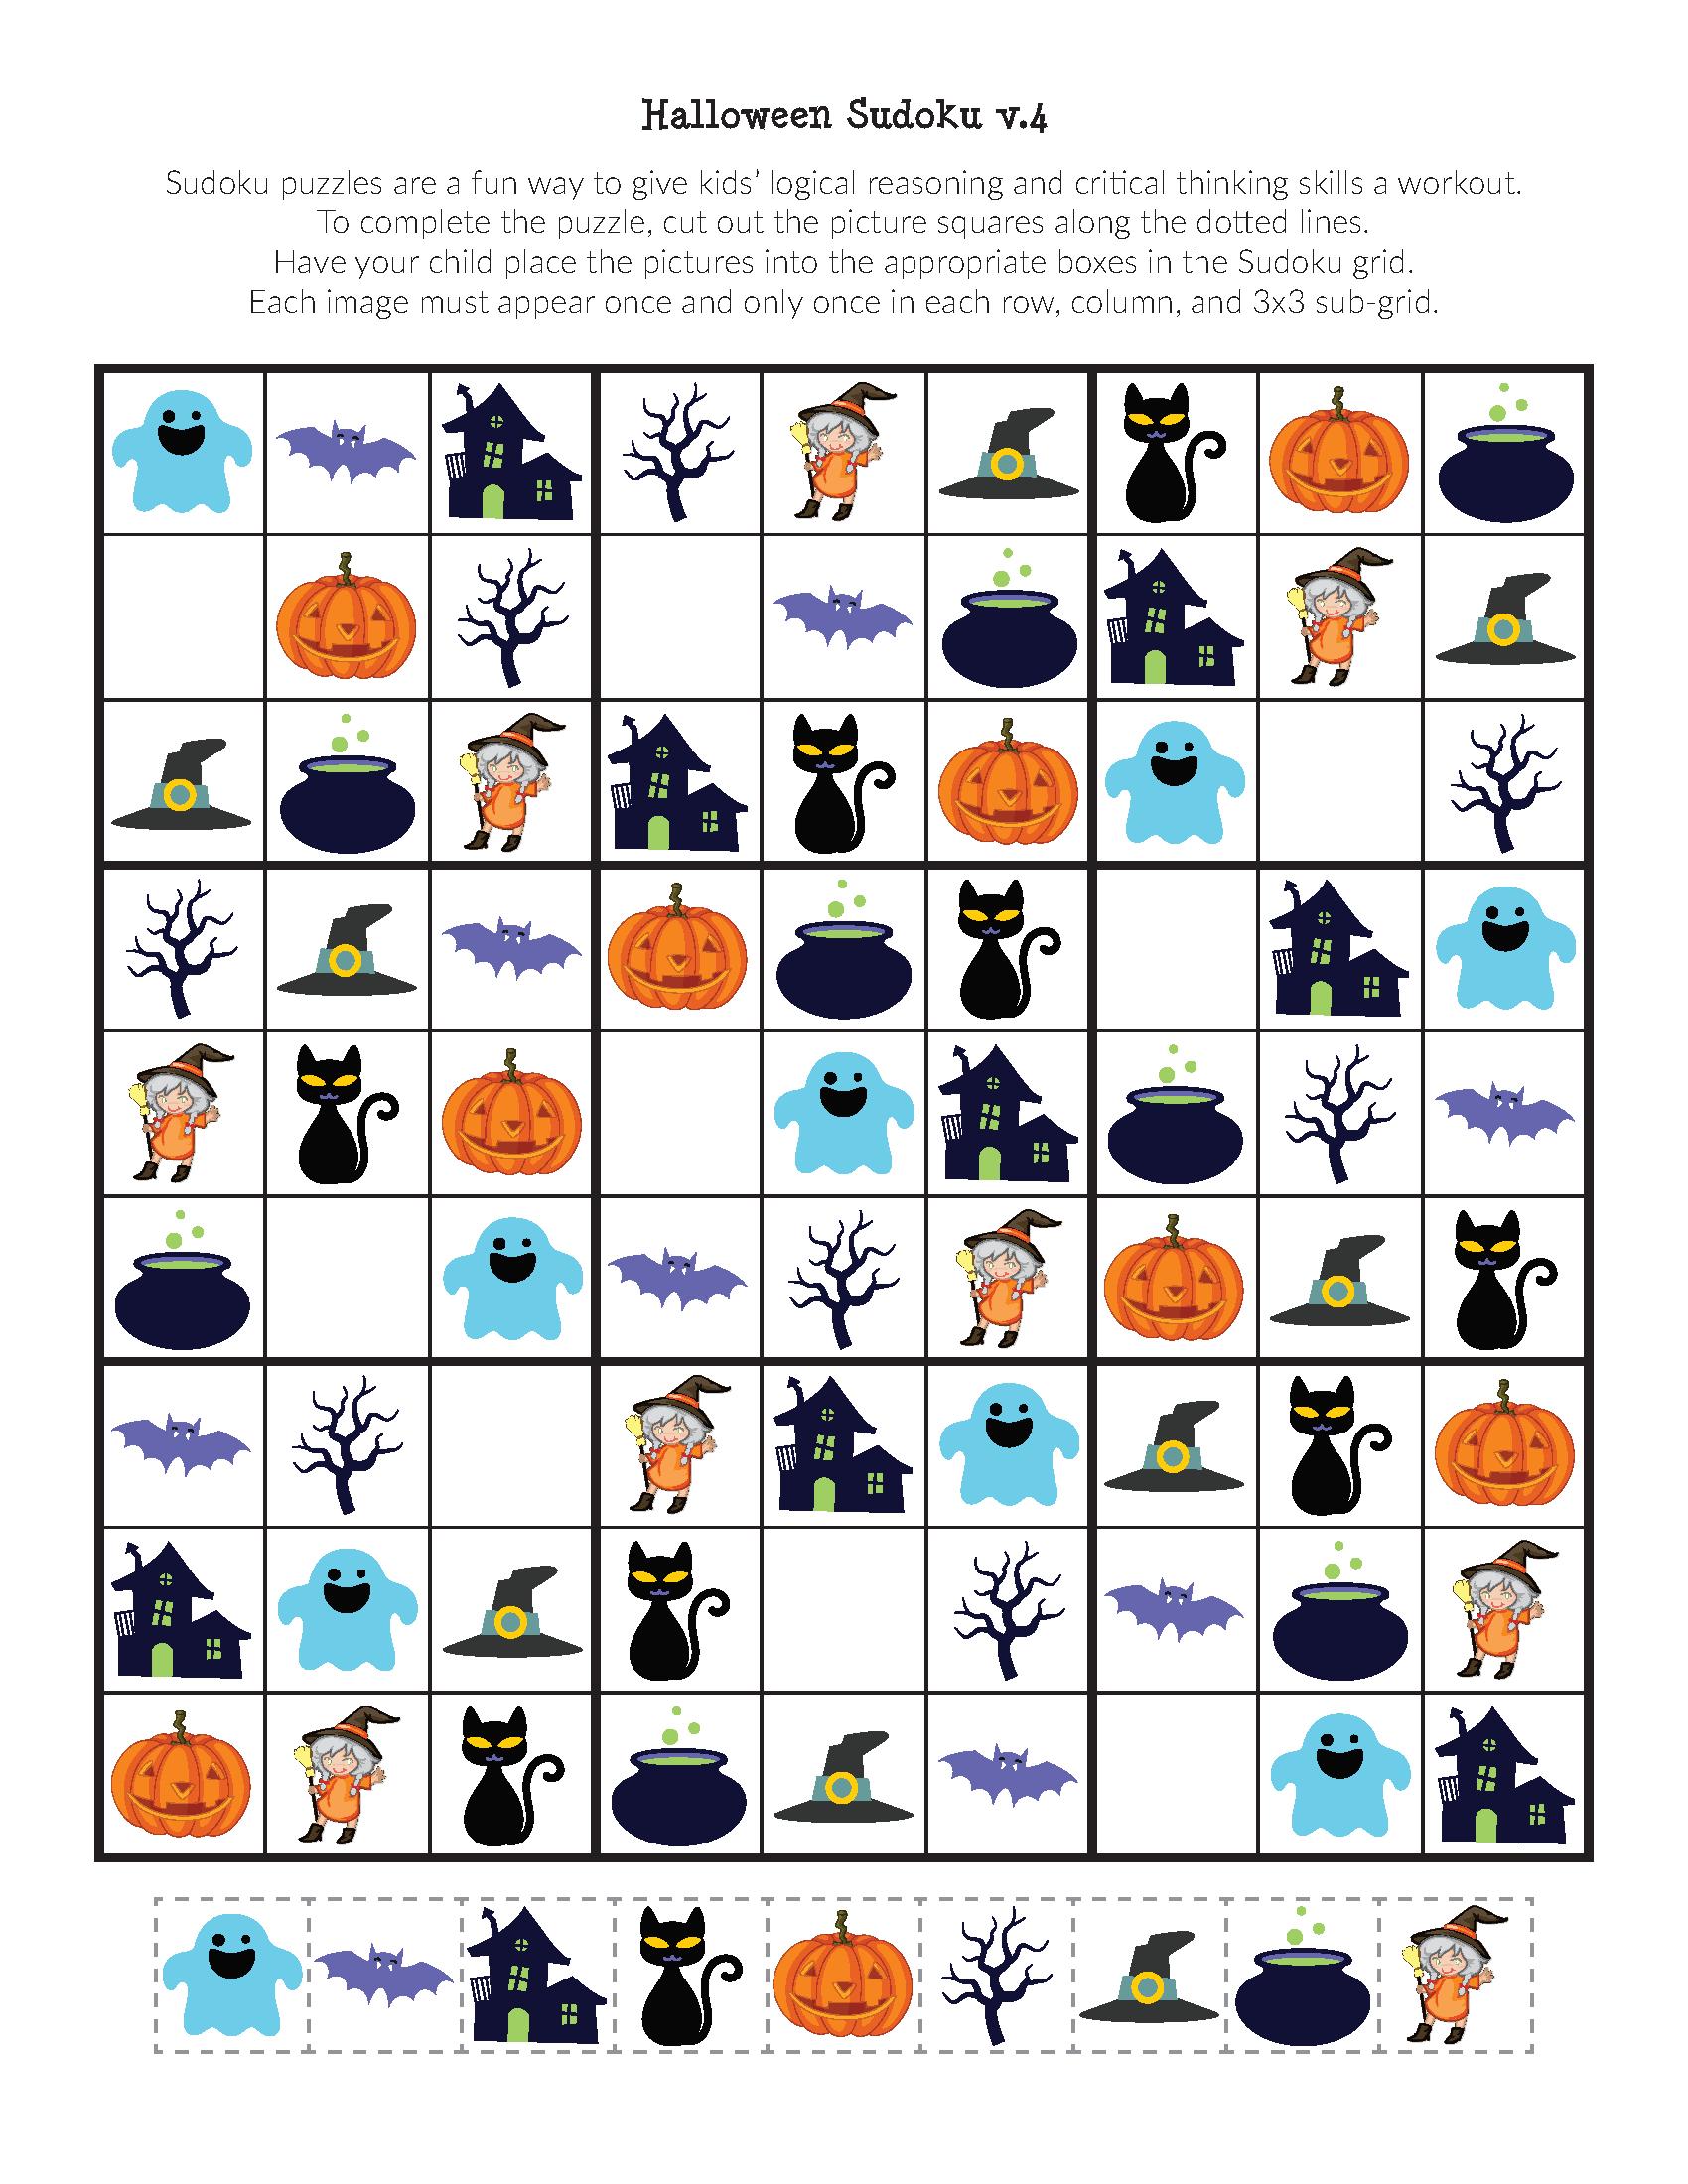 Halloween Sudoku Puzzles - Gift Of Curiosity